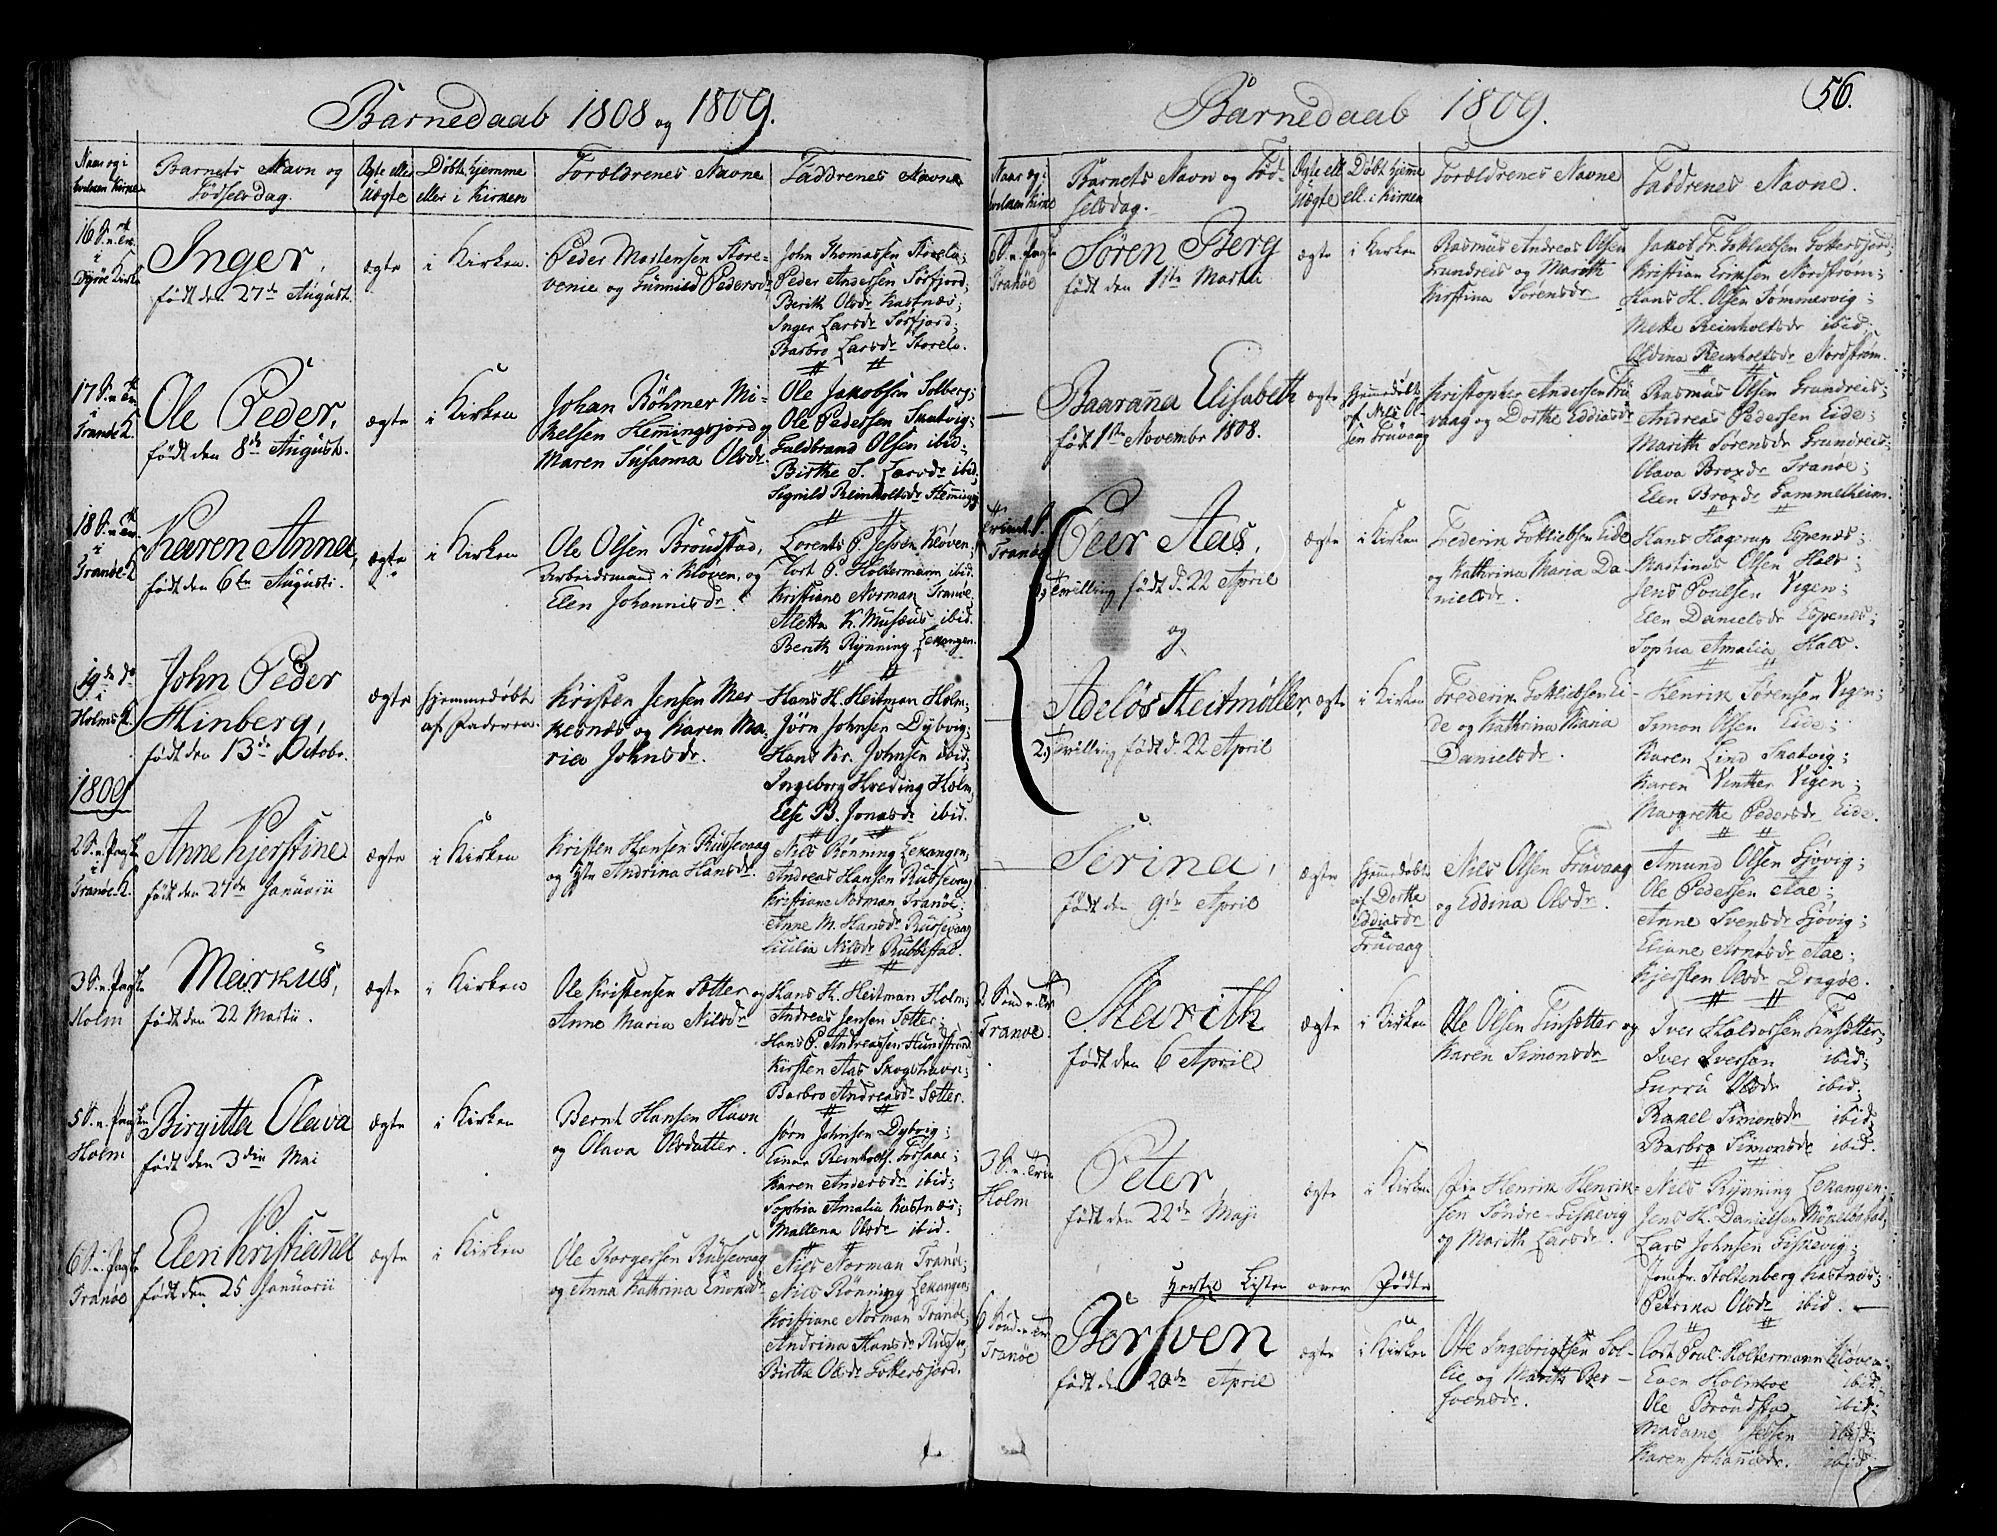 SATØ, Tranøy sokneprestkontor, I/Ia/Iaa/L0003kirke: Ministerialbok nr. 3, 1807-1820, s. 56